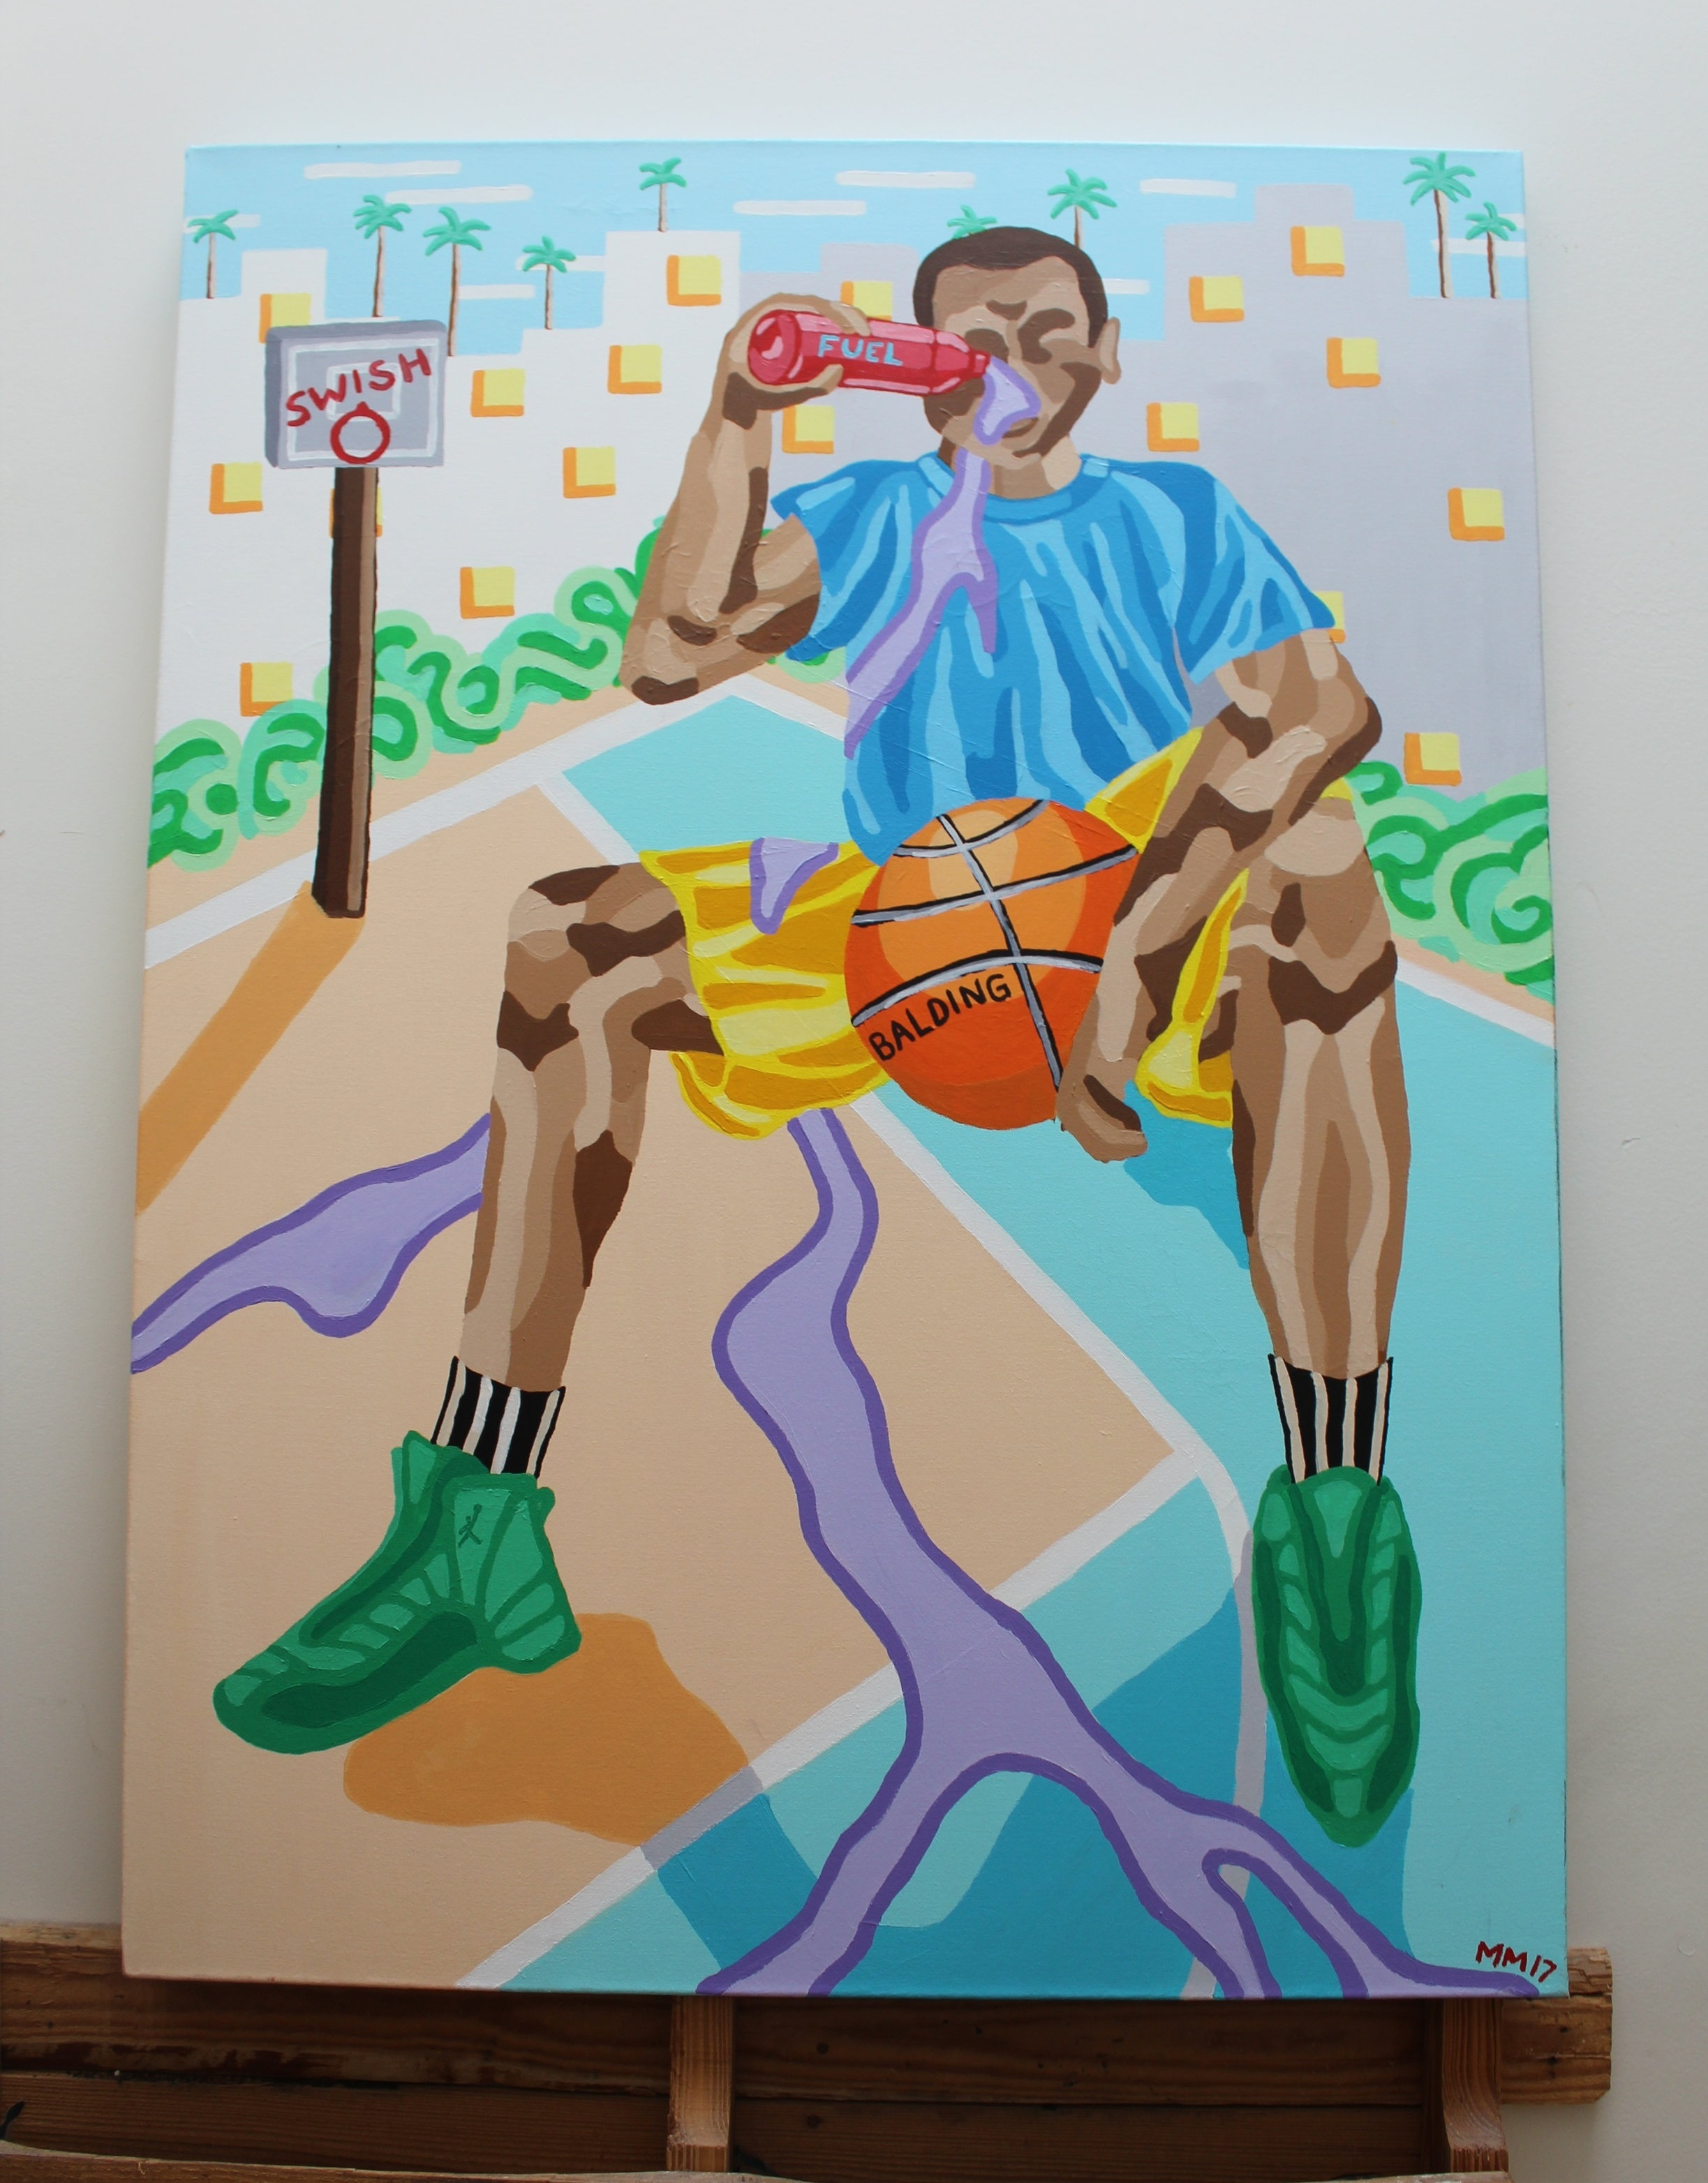 Balding 2018 Acrylic on Canvas 4 x 3 ft